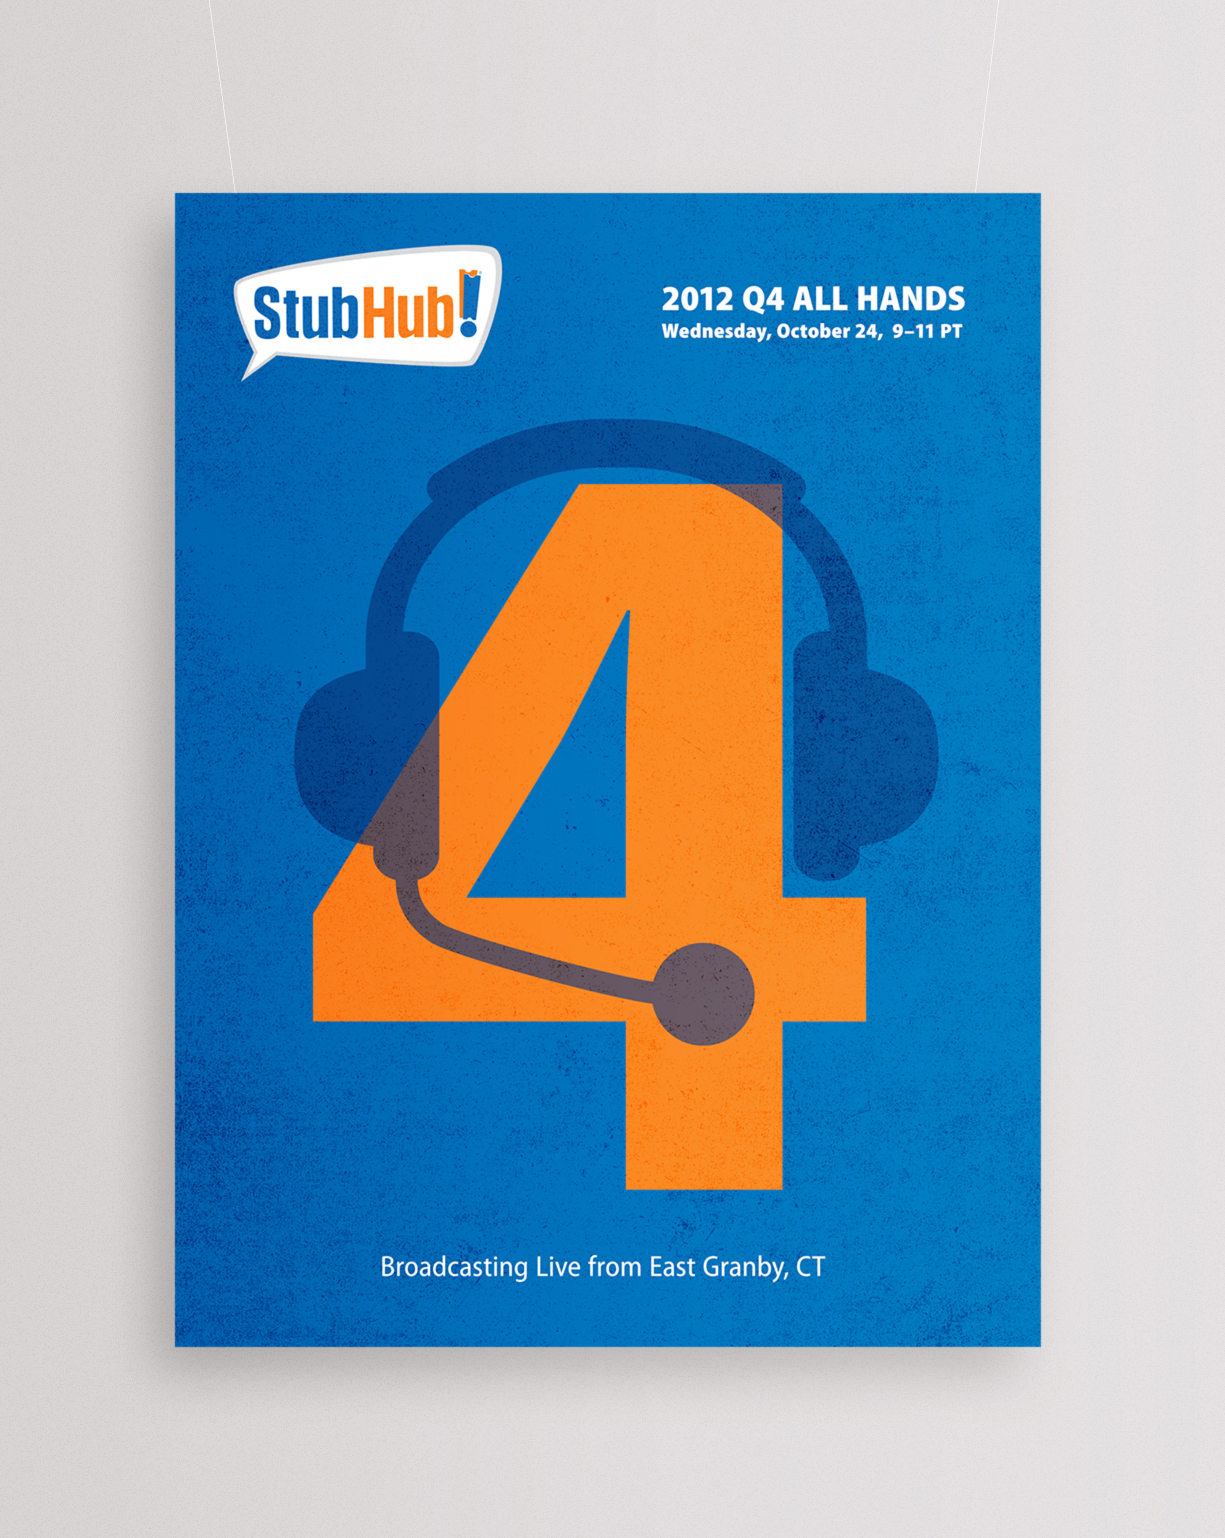 stubhub_2012-Q4_Poster.jpg